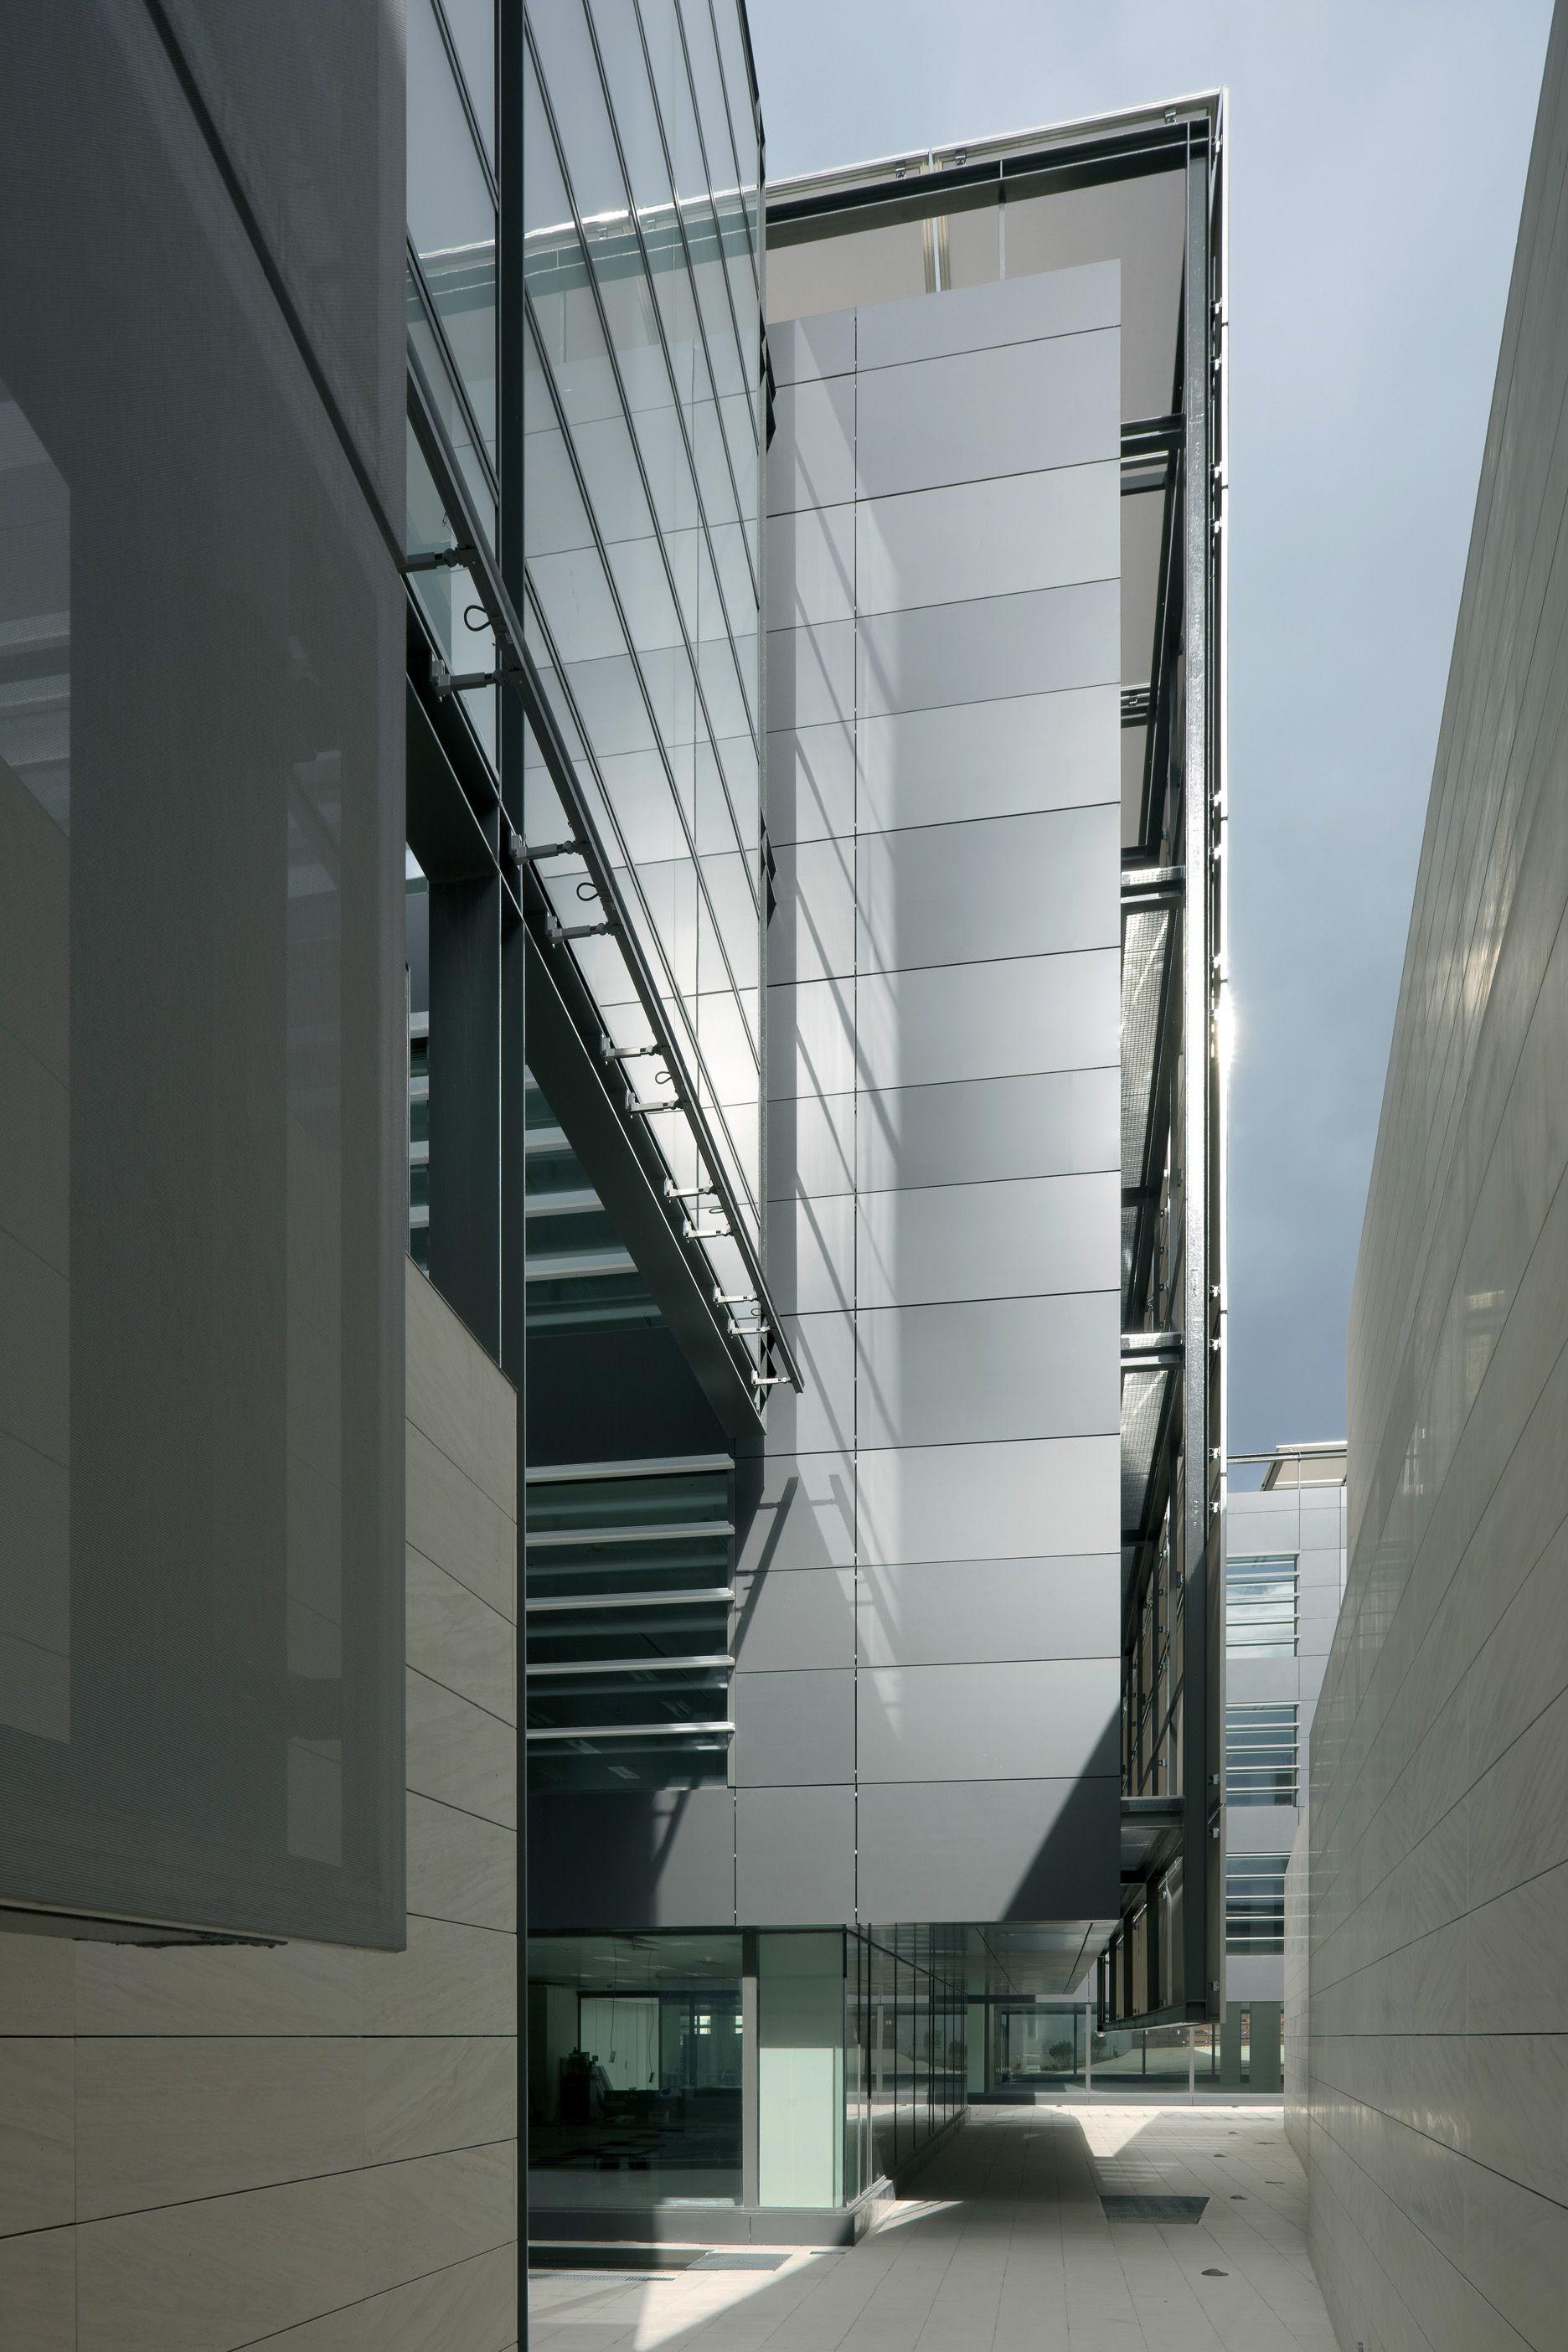 Tripark las rozas allende arquitectos madrid 2009 leed gold core shell office pinterest - Arquitectos madrid ...